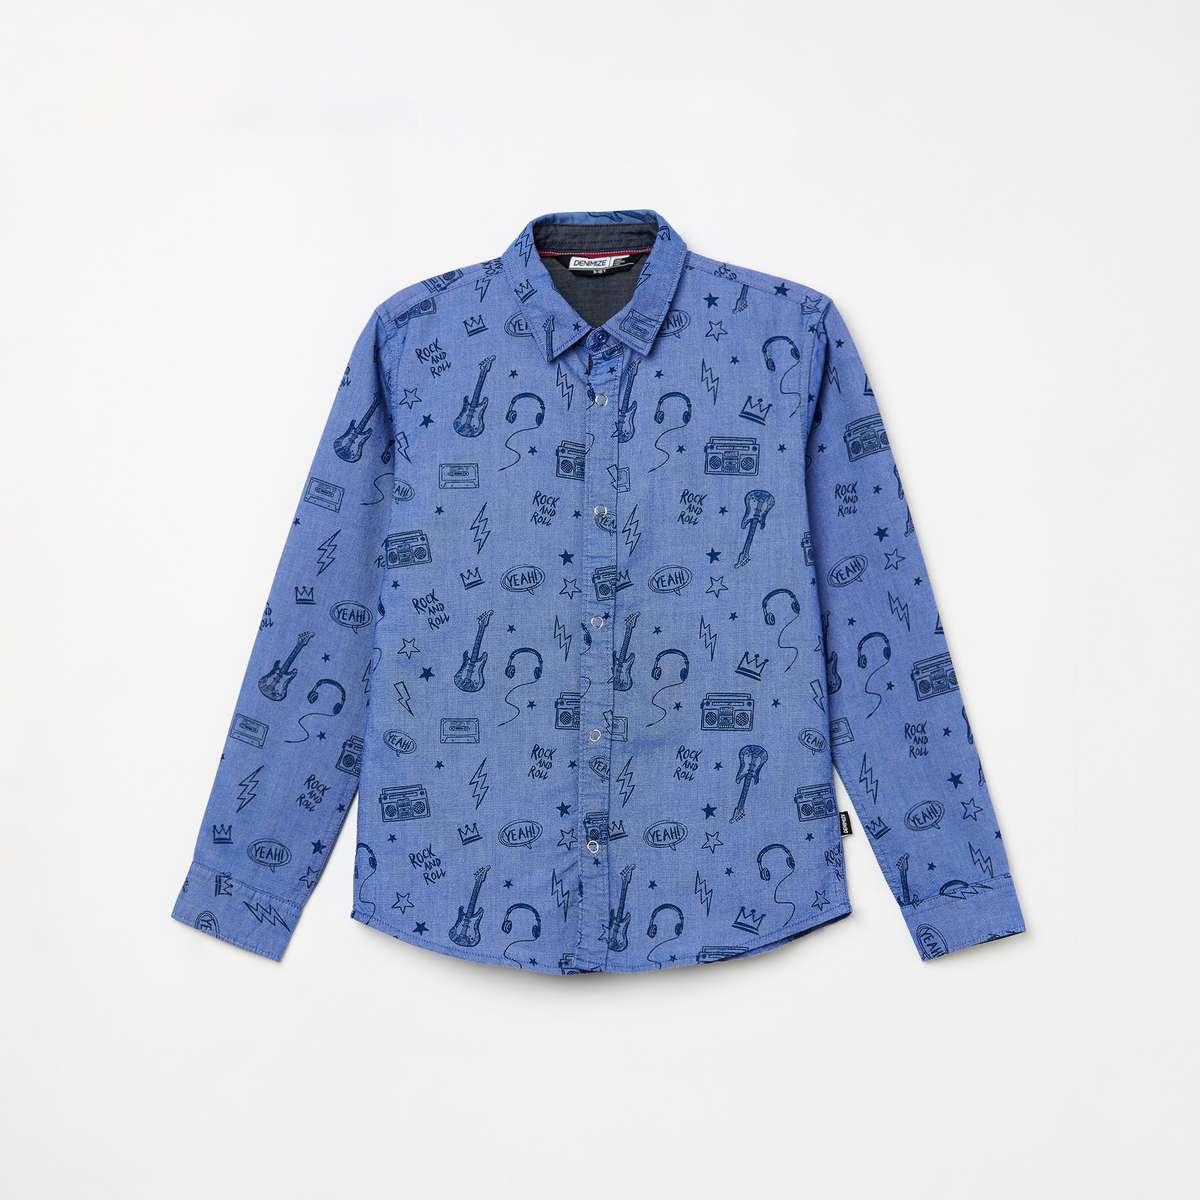 1.DENIMIZE Boys Printed Casual Shirt